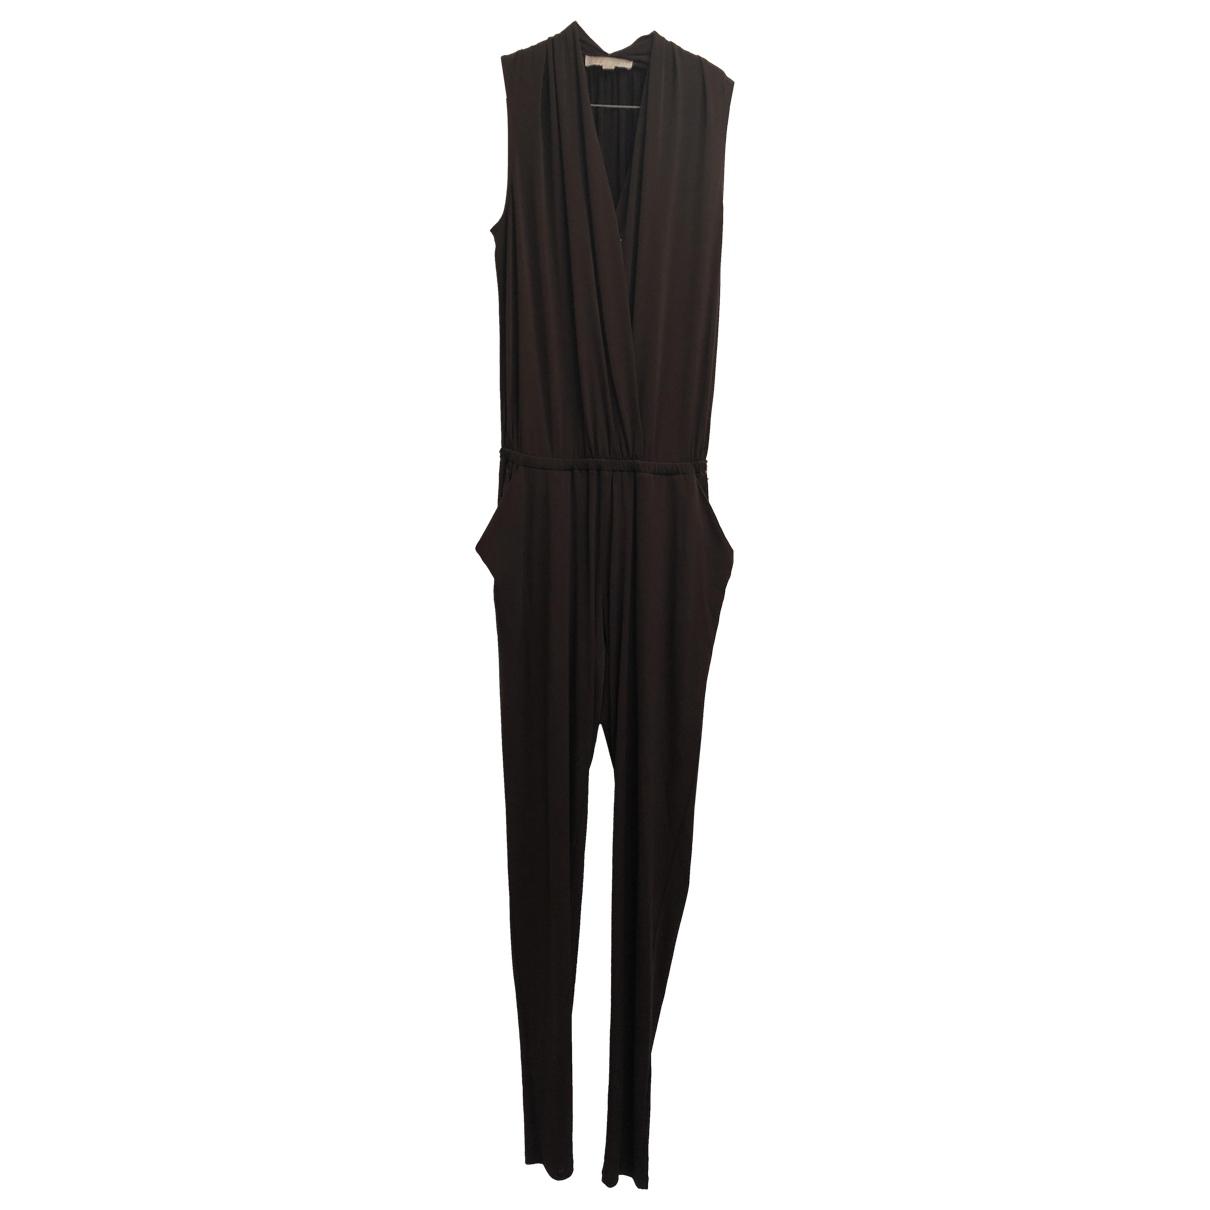 Michael Kors \N Brown jumpsuit for Women XS International